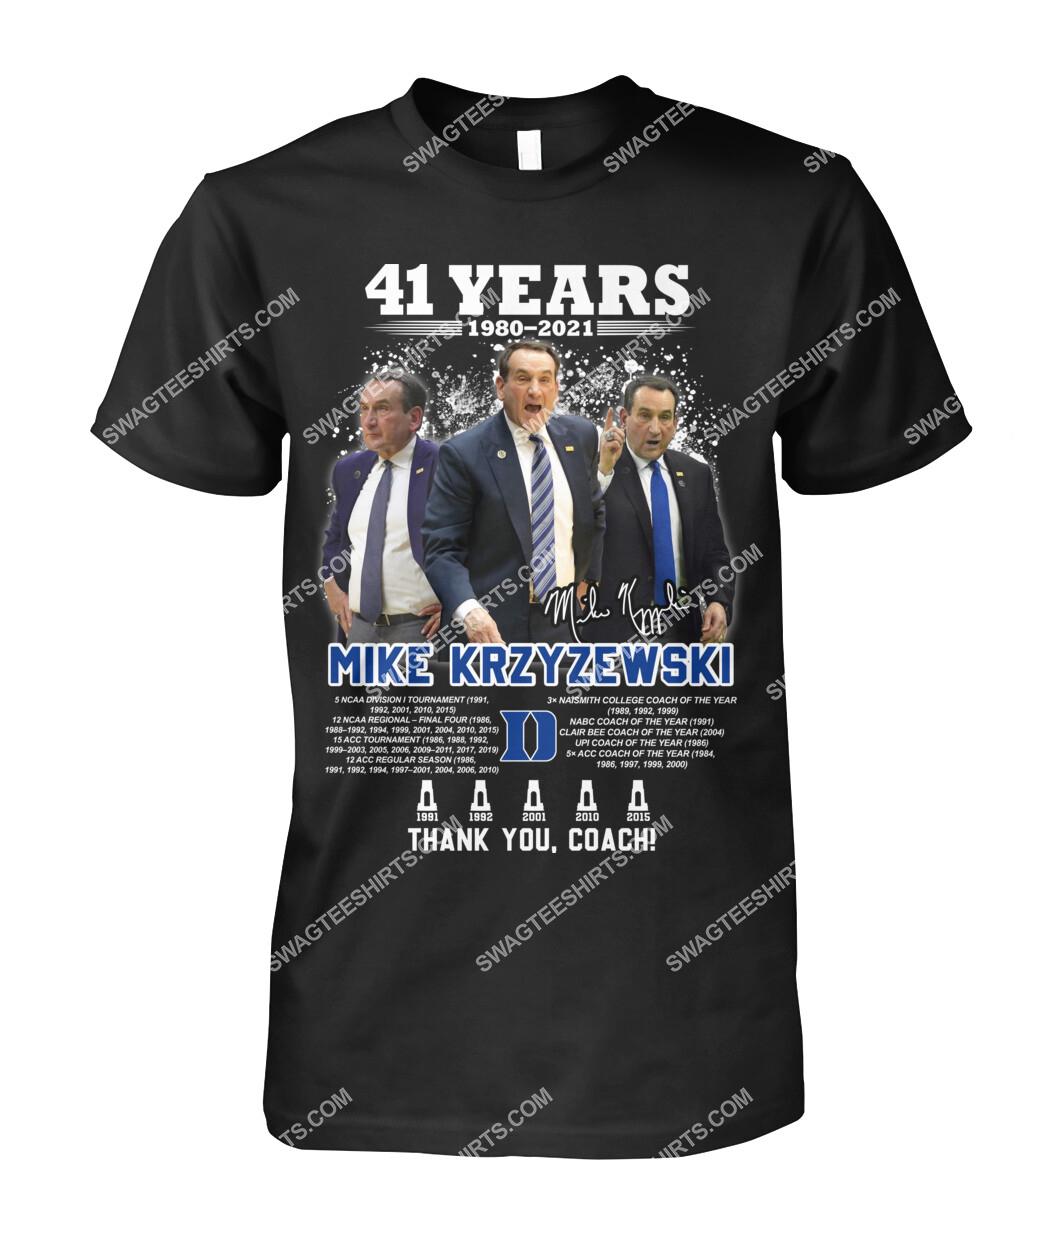 41 years 190 2021 mike krzyzewski thank you coach signatures tshirt 1